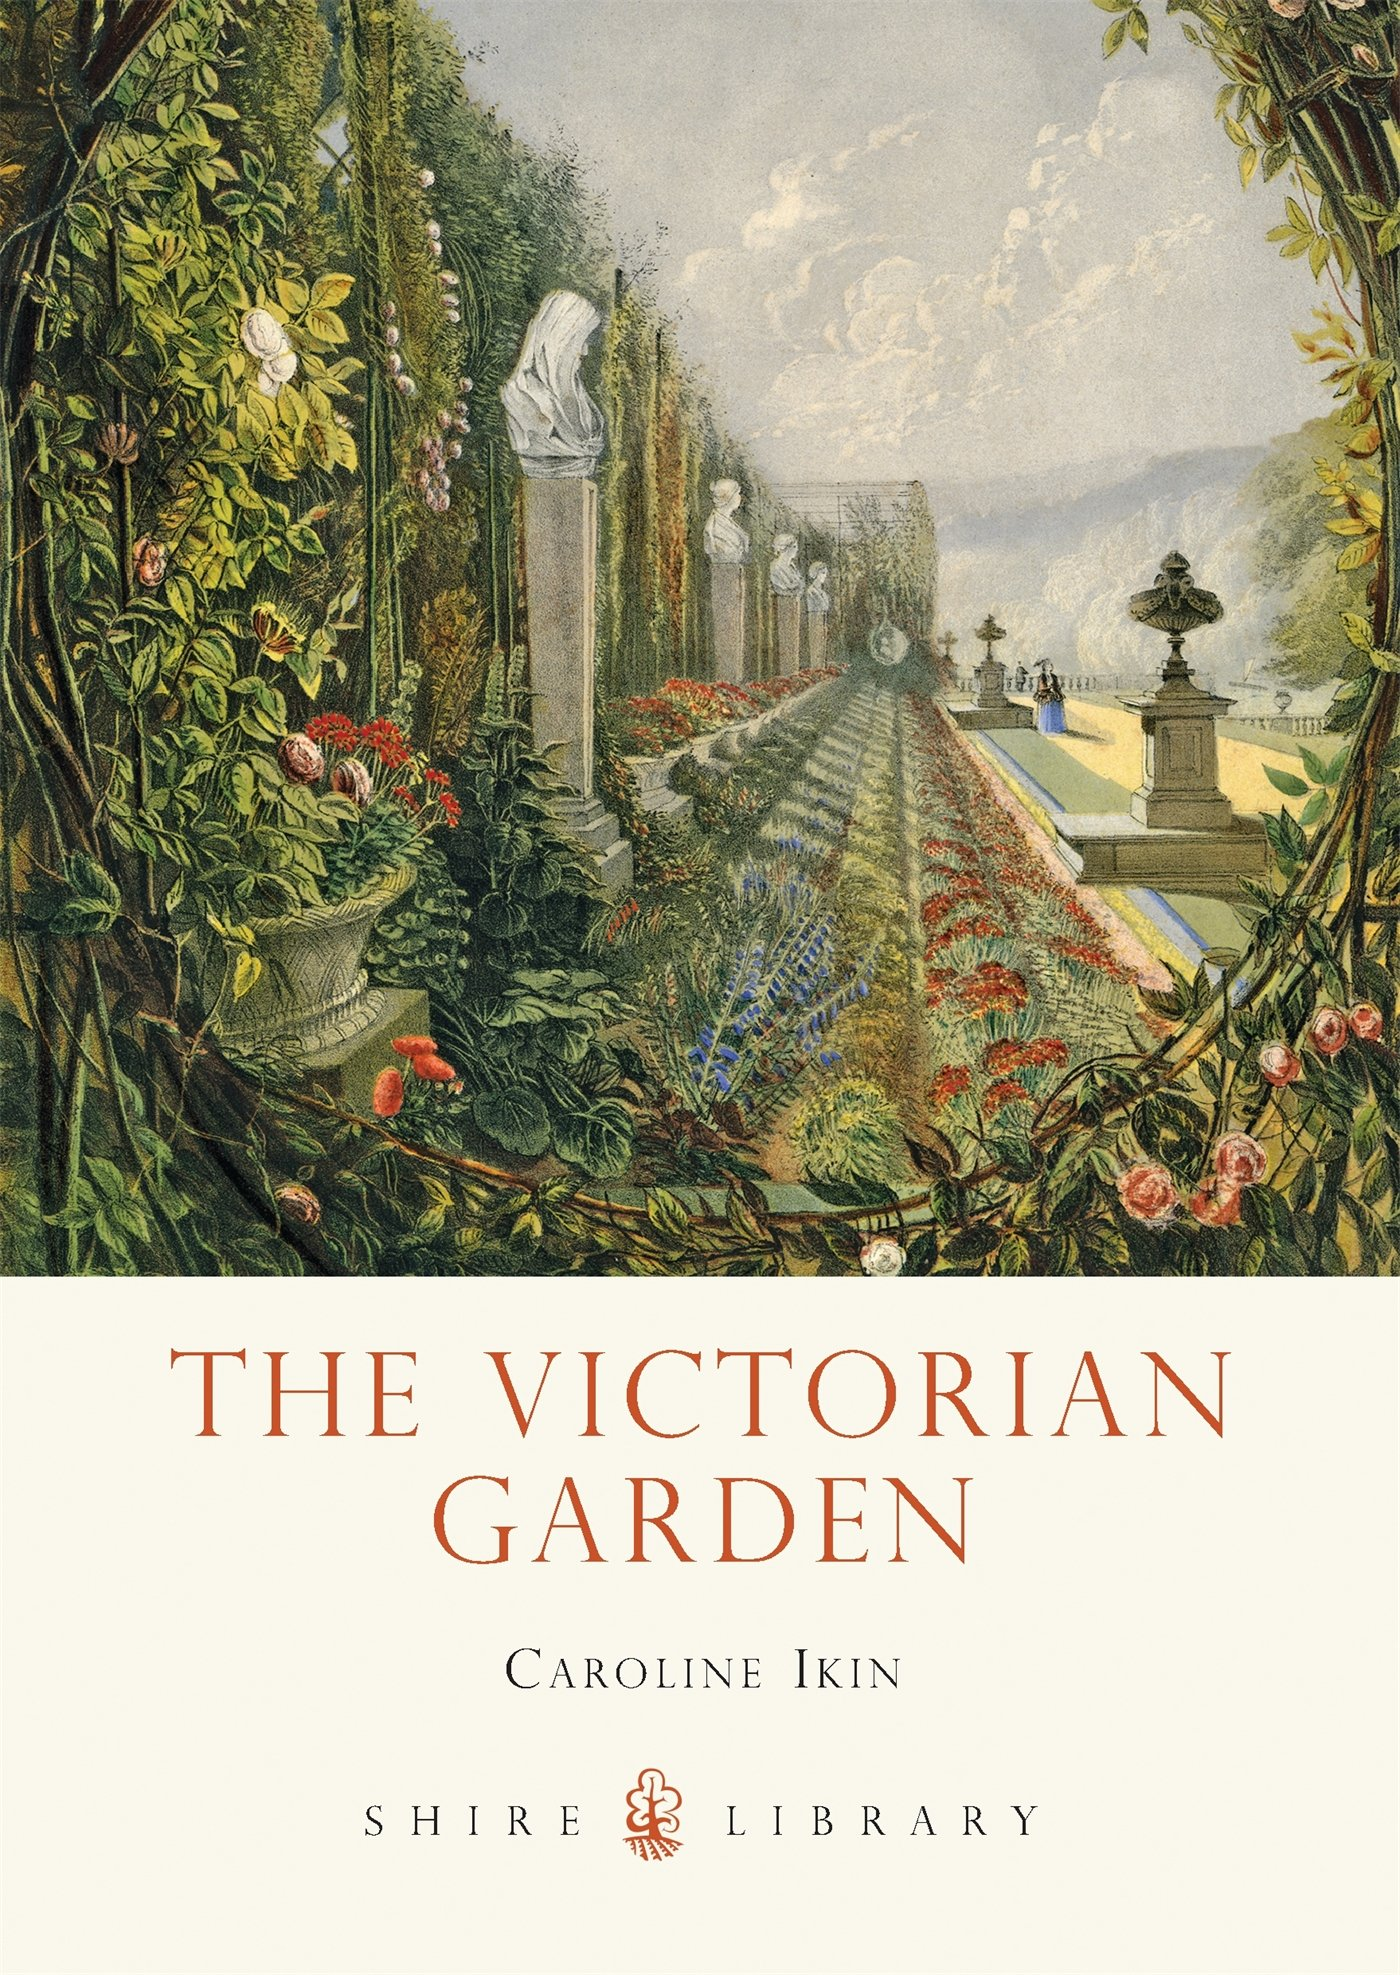 Amazon.com: The Victorian Garden (Shire Library) (9780747811527): Caroline  Ikin: Books